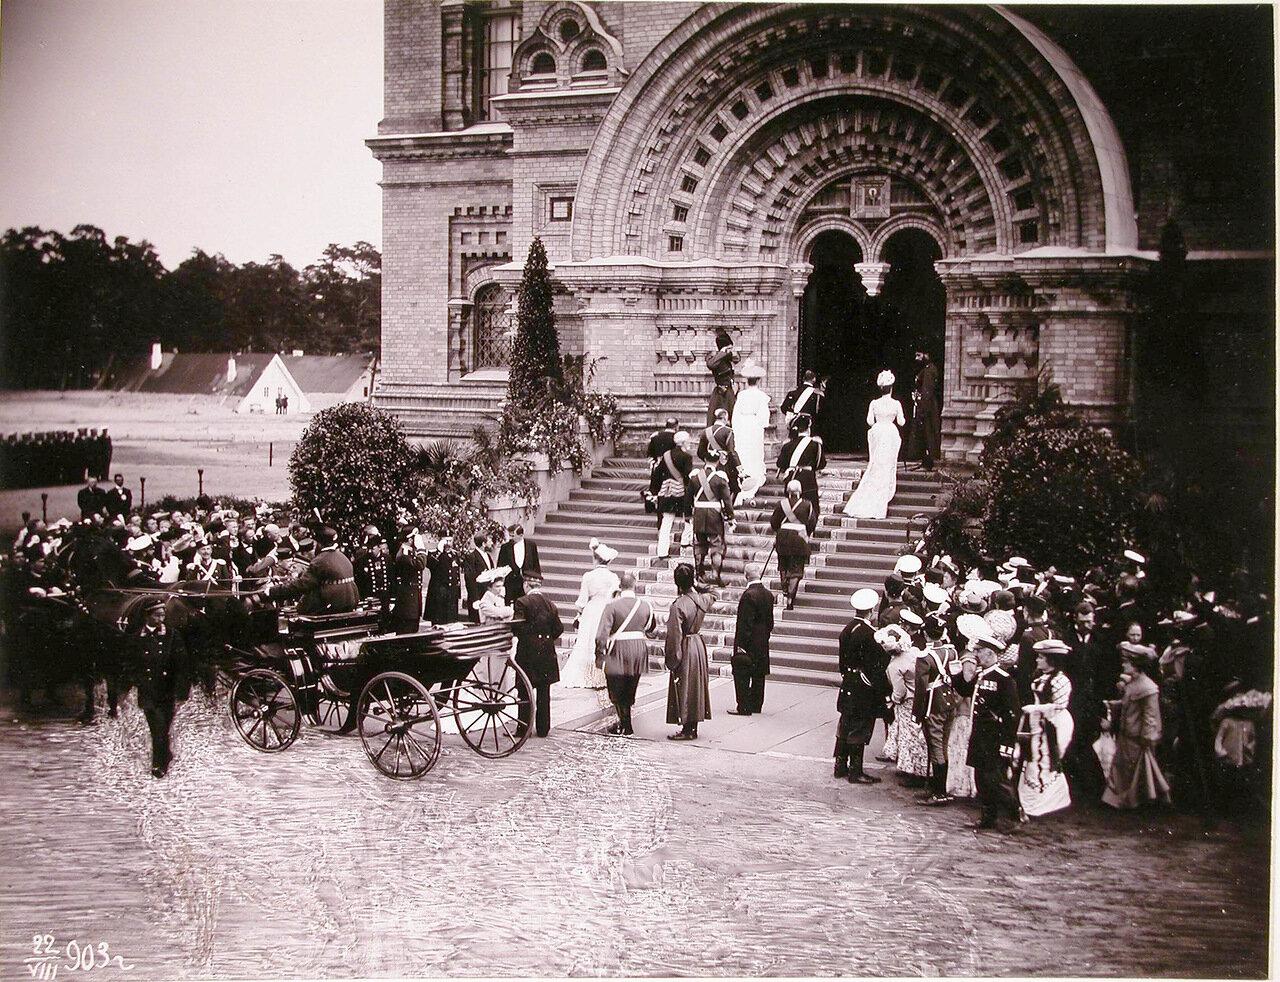 Император Николай II (на лестнице), императрица Александра Федоровна, вдовствующая императрица Мария Федоровна, великий князь генерал-адмирал Алексей Александрович и прочие входят в Морской собор